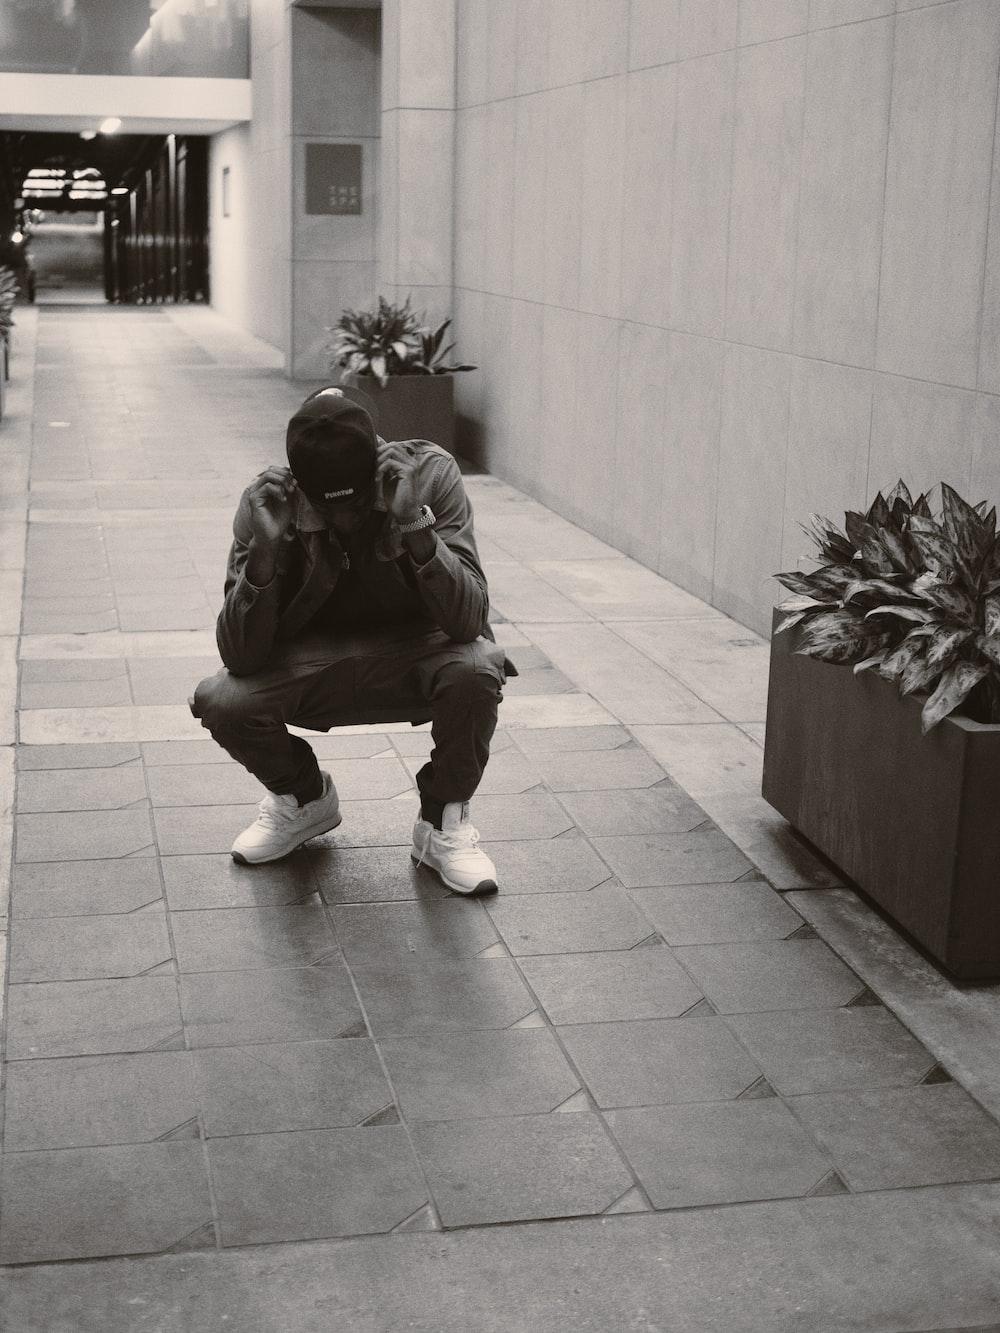 man in black jacket sitting on concrete bench